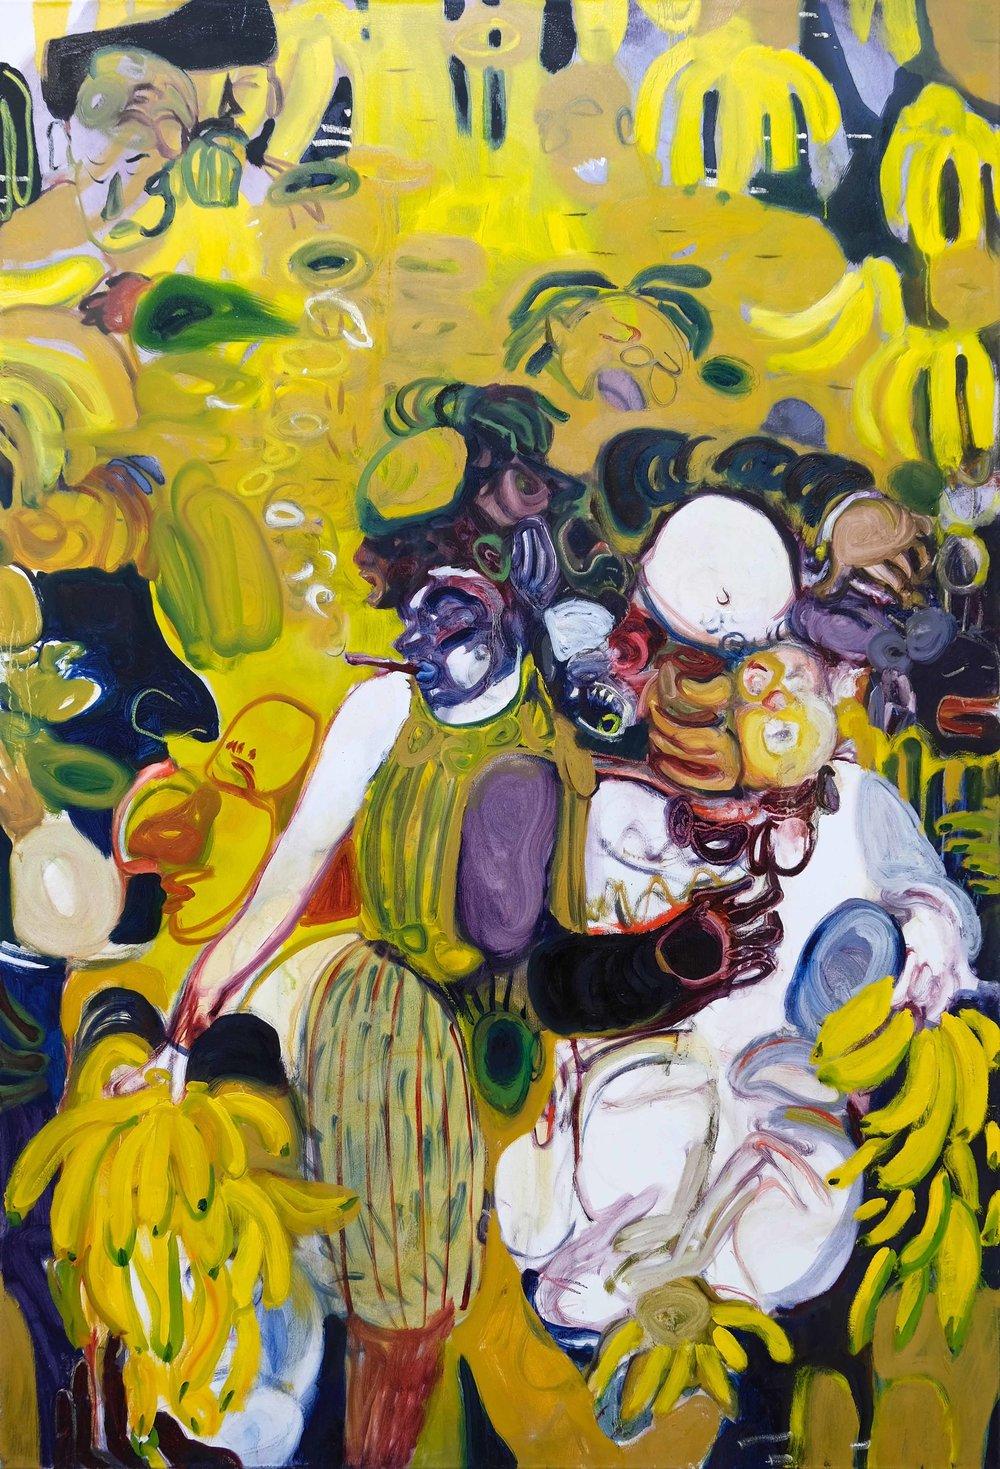 Fever Dancer  (2018) Oil on canvas, 115 x 170cm